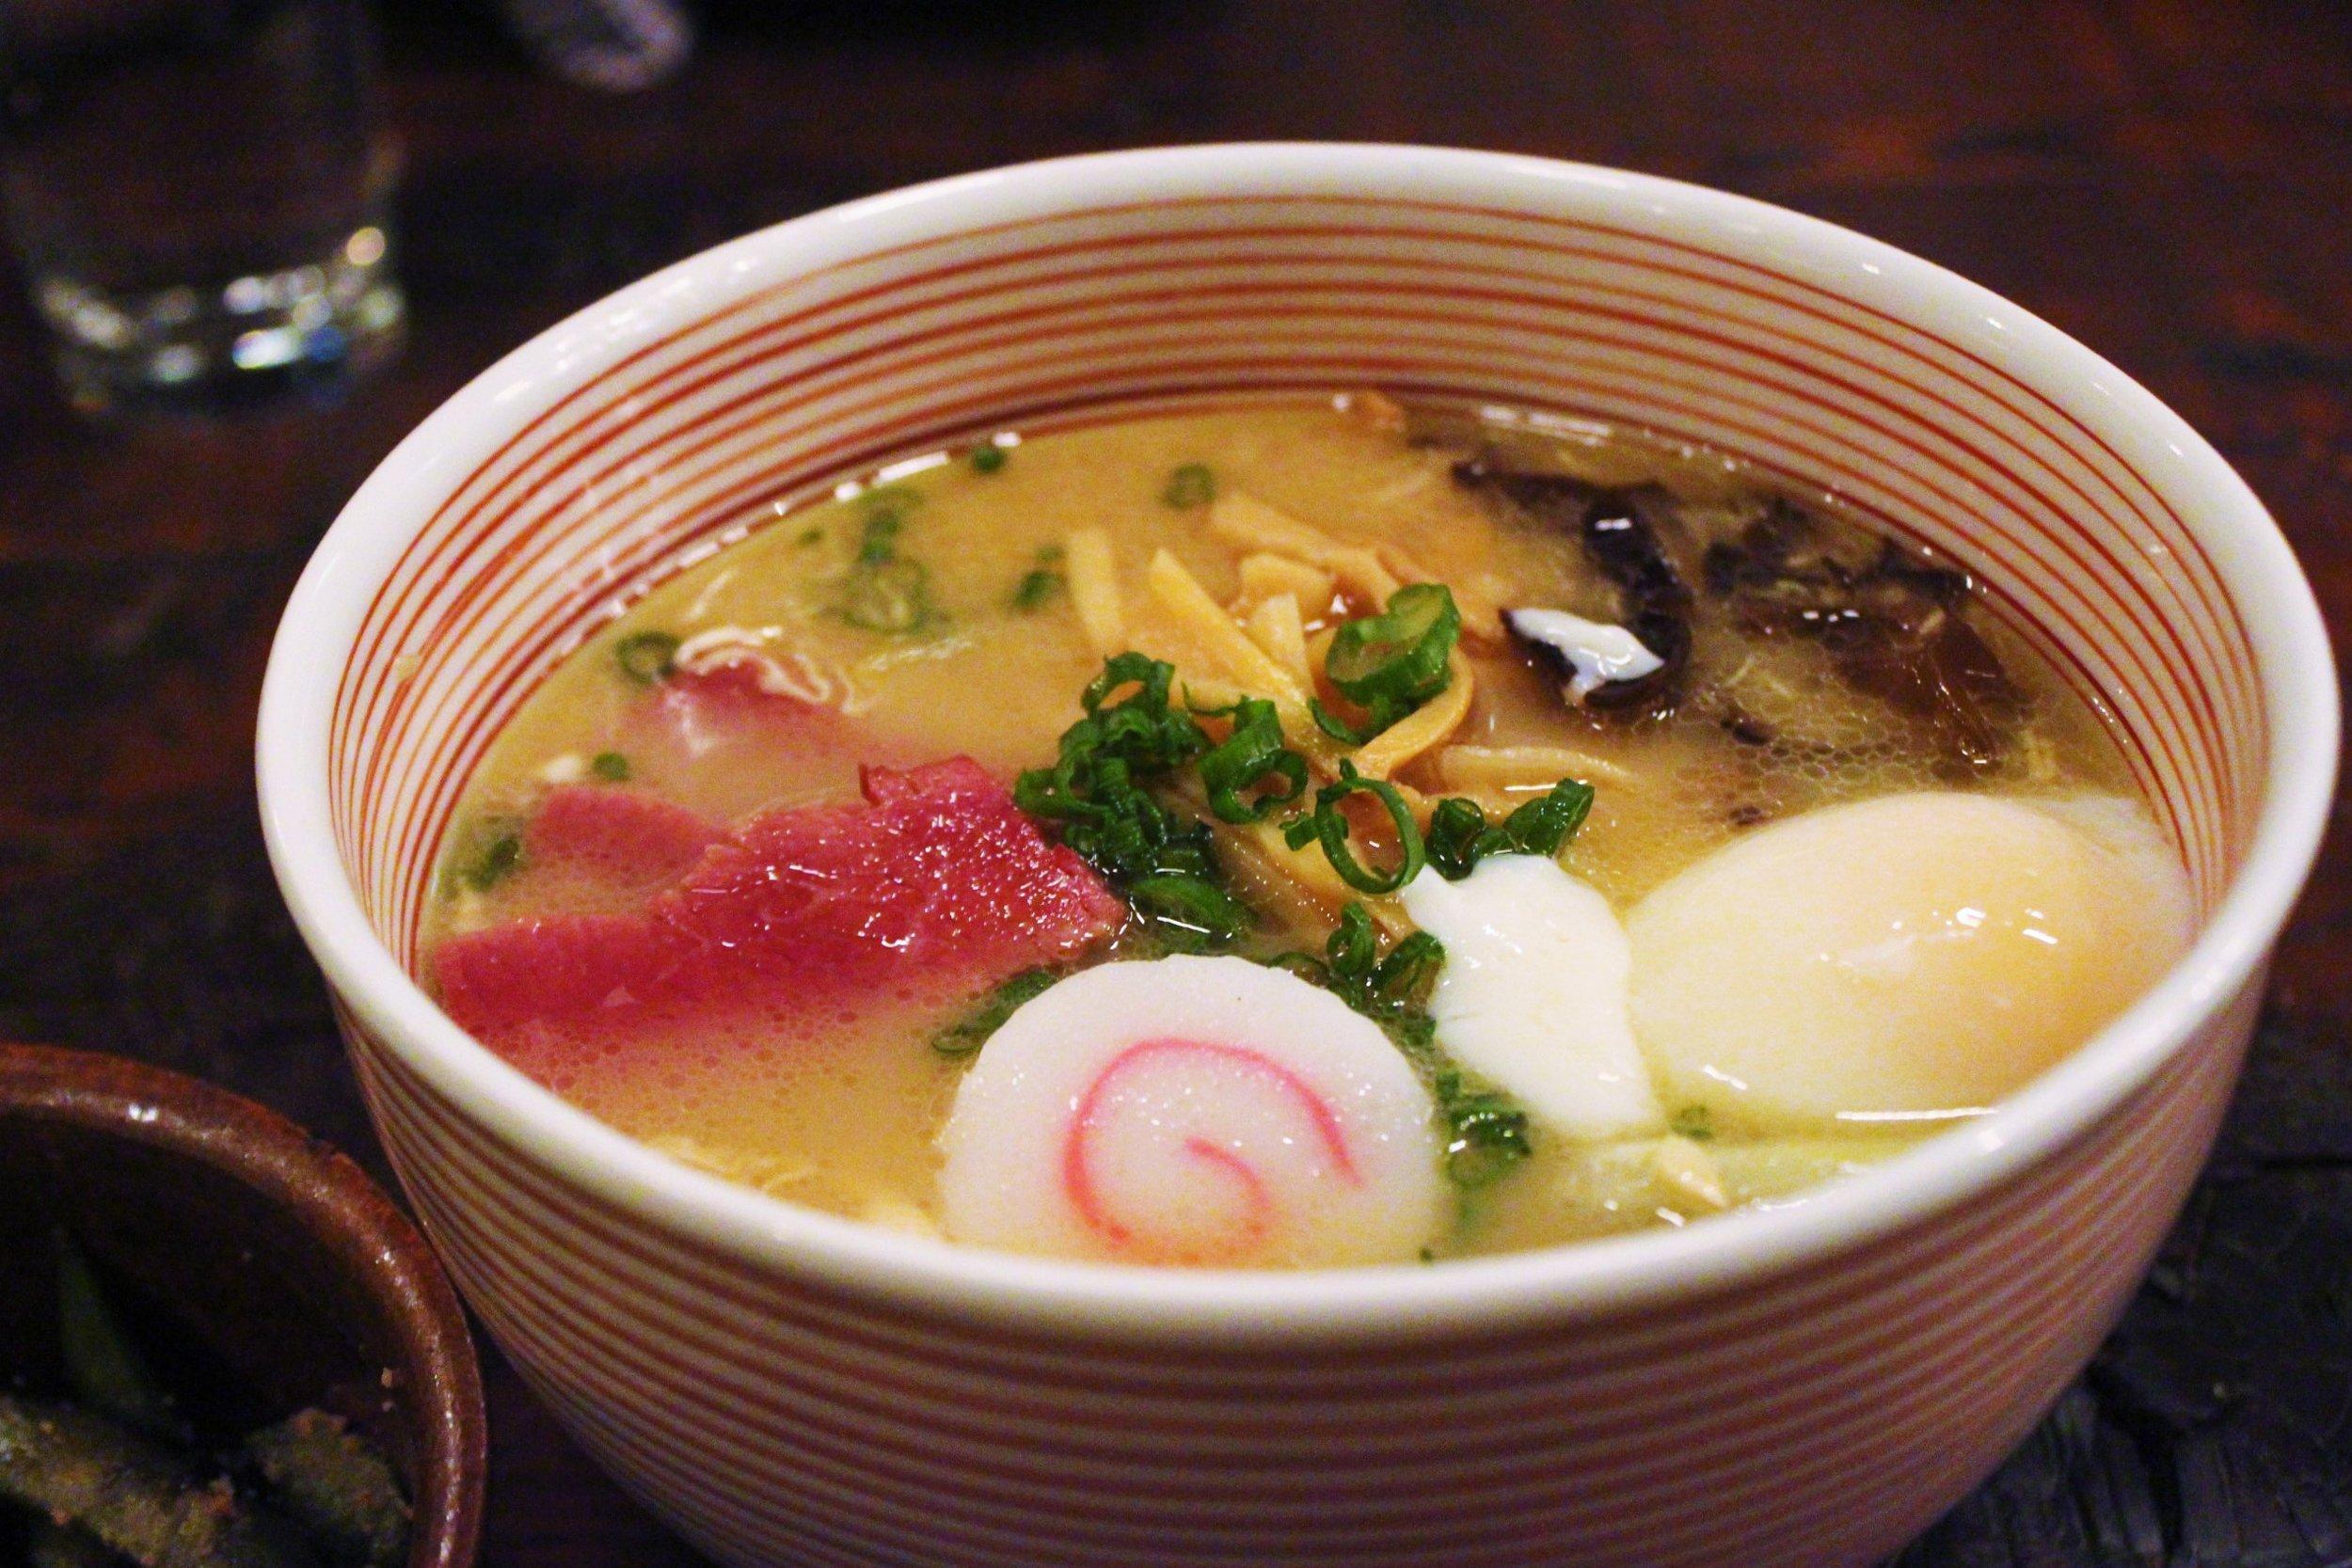 Mu Ramen: Oxtail and Bone Marrow Based Soup, Corned Beef